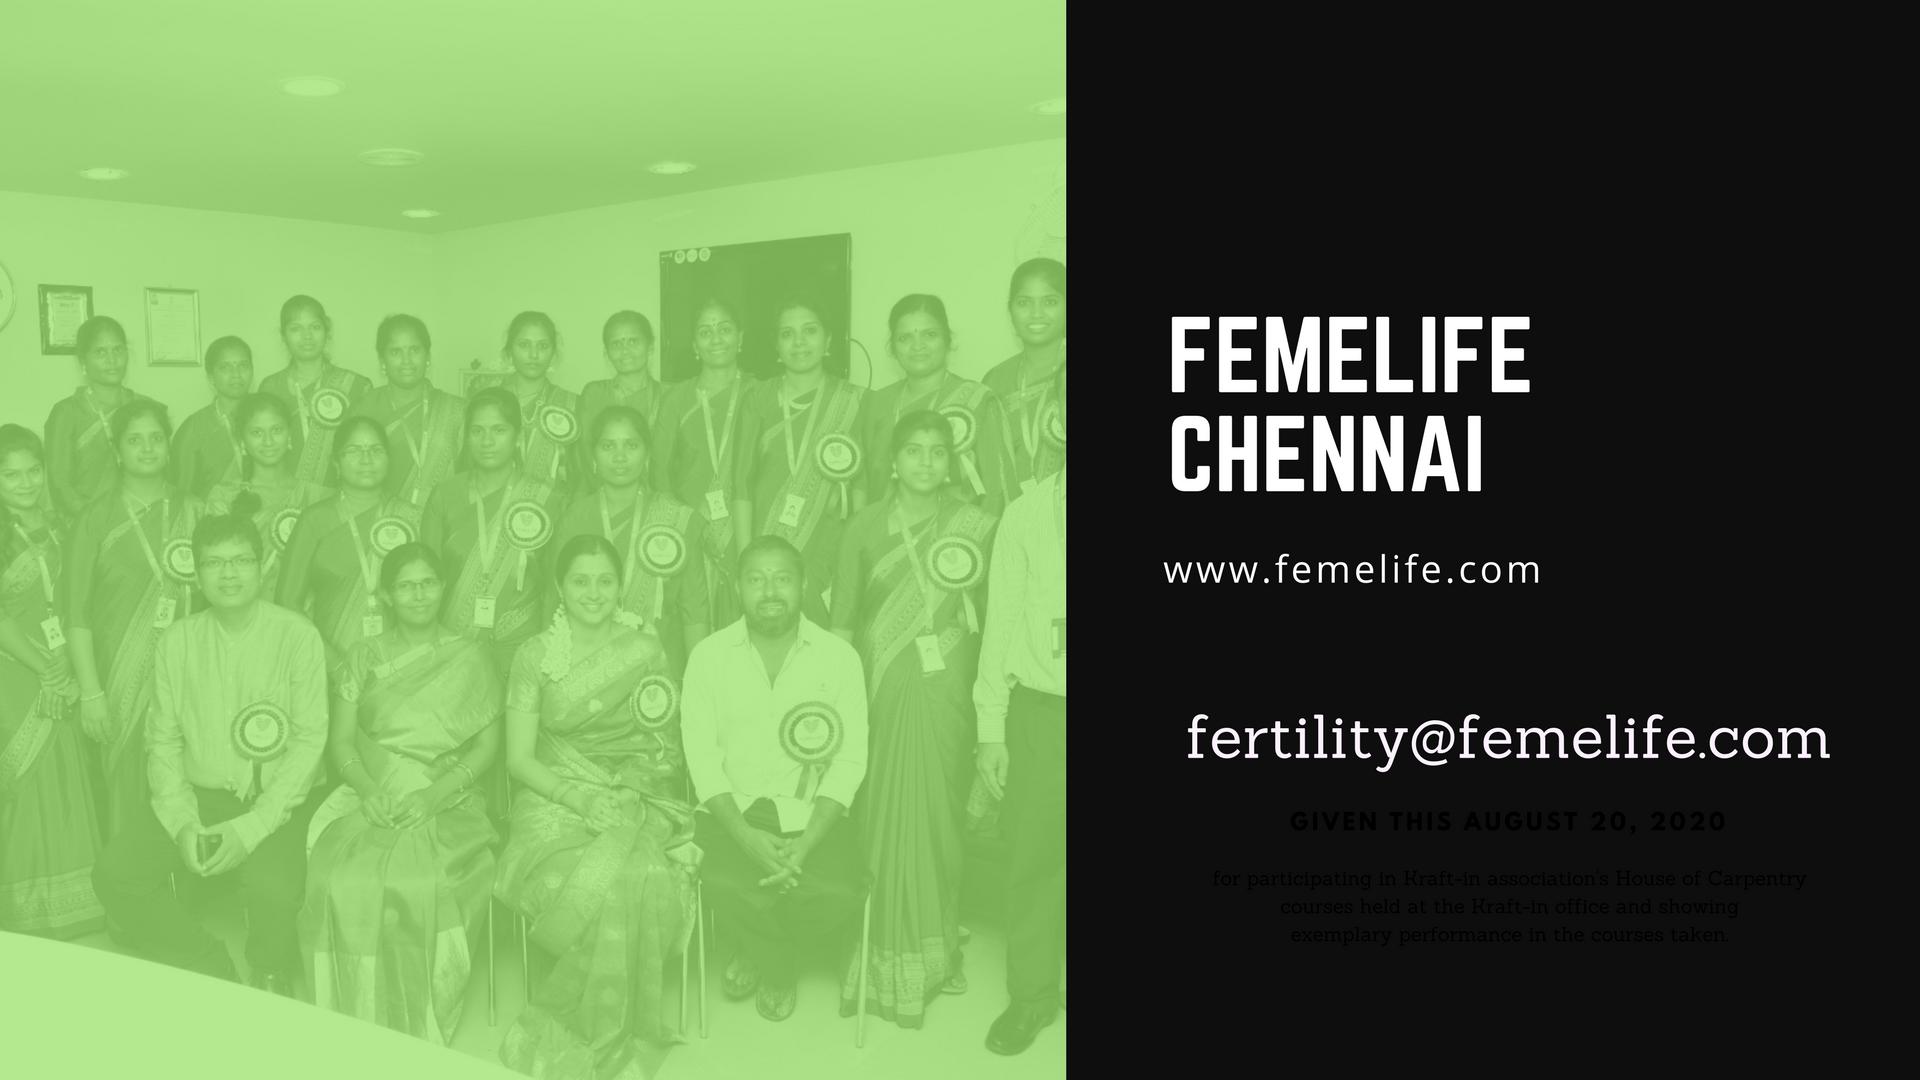 Pin on Femelife fertility